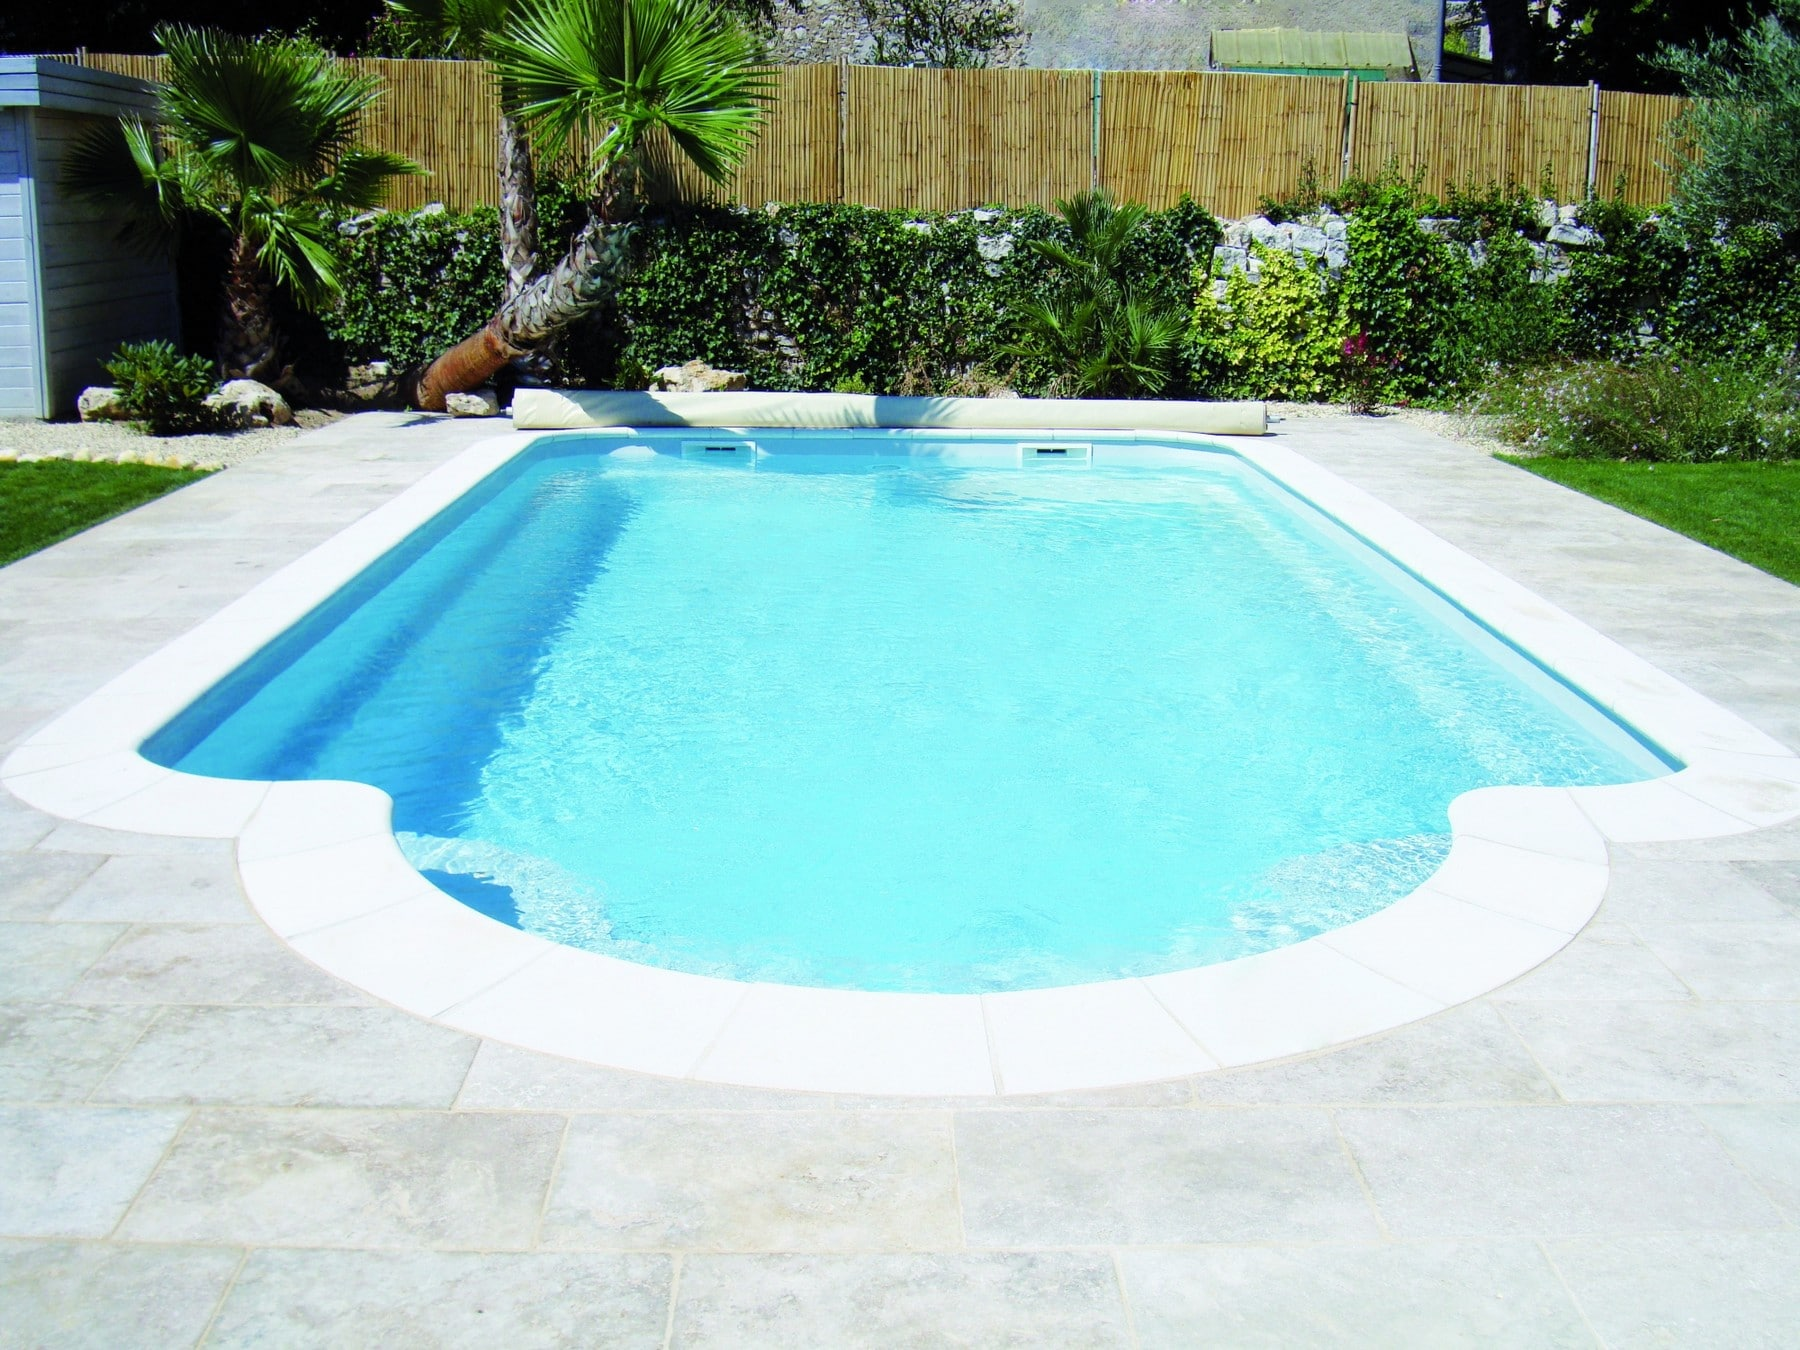 piscine coque enterrée